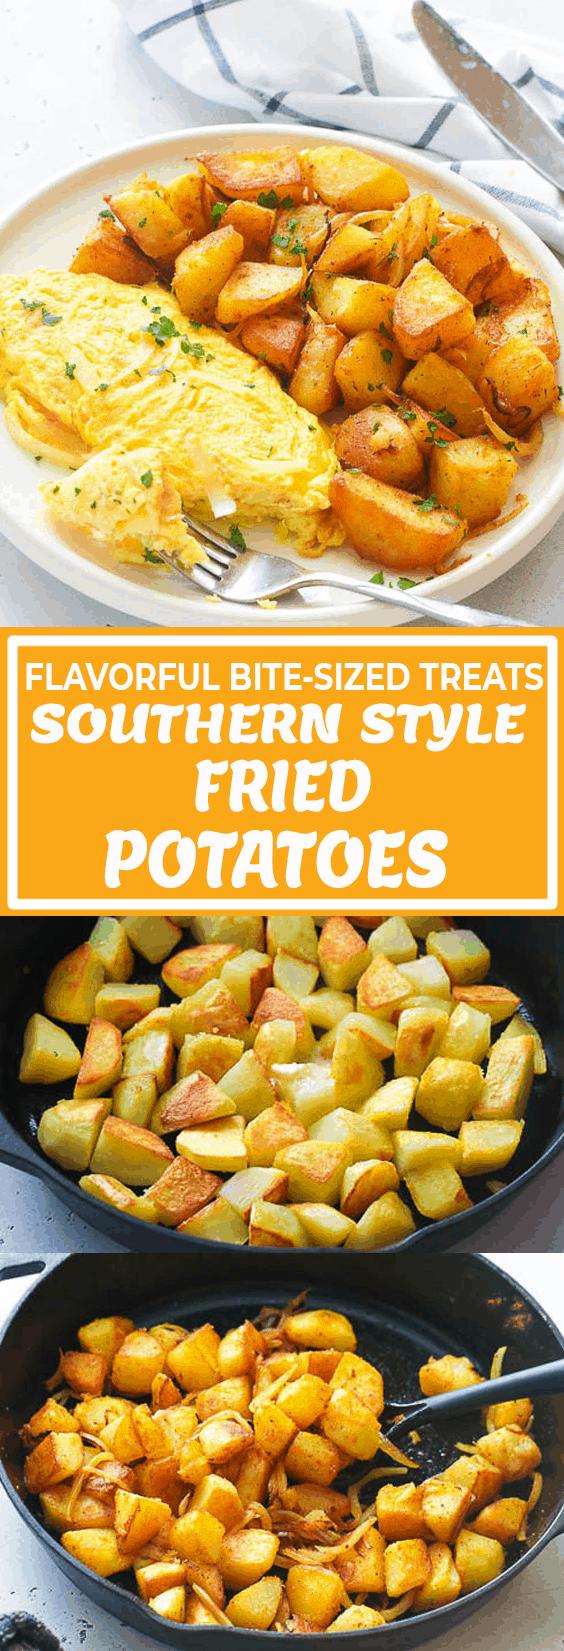 How To Make Southern Fried Potatoes